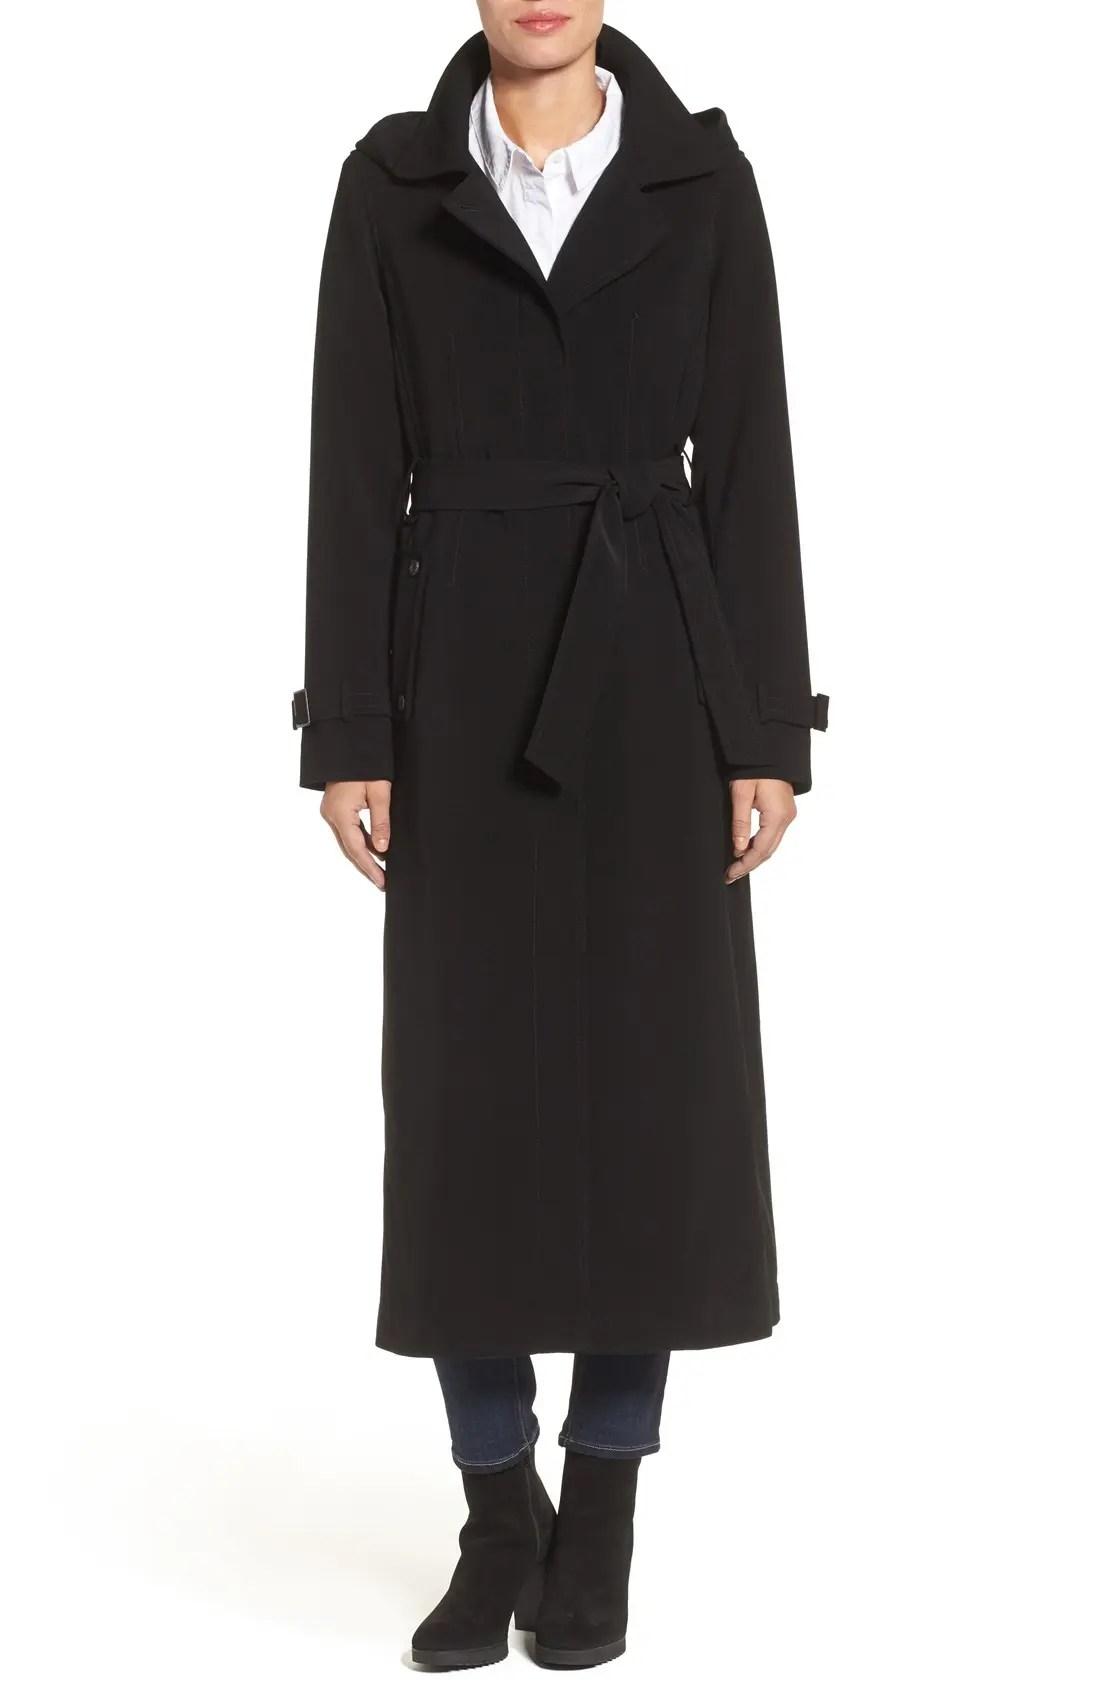 Gallery Petite Full Length Hooded Nepage Raincoat $239.9